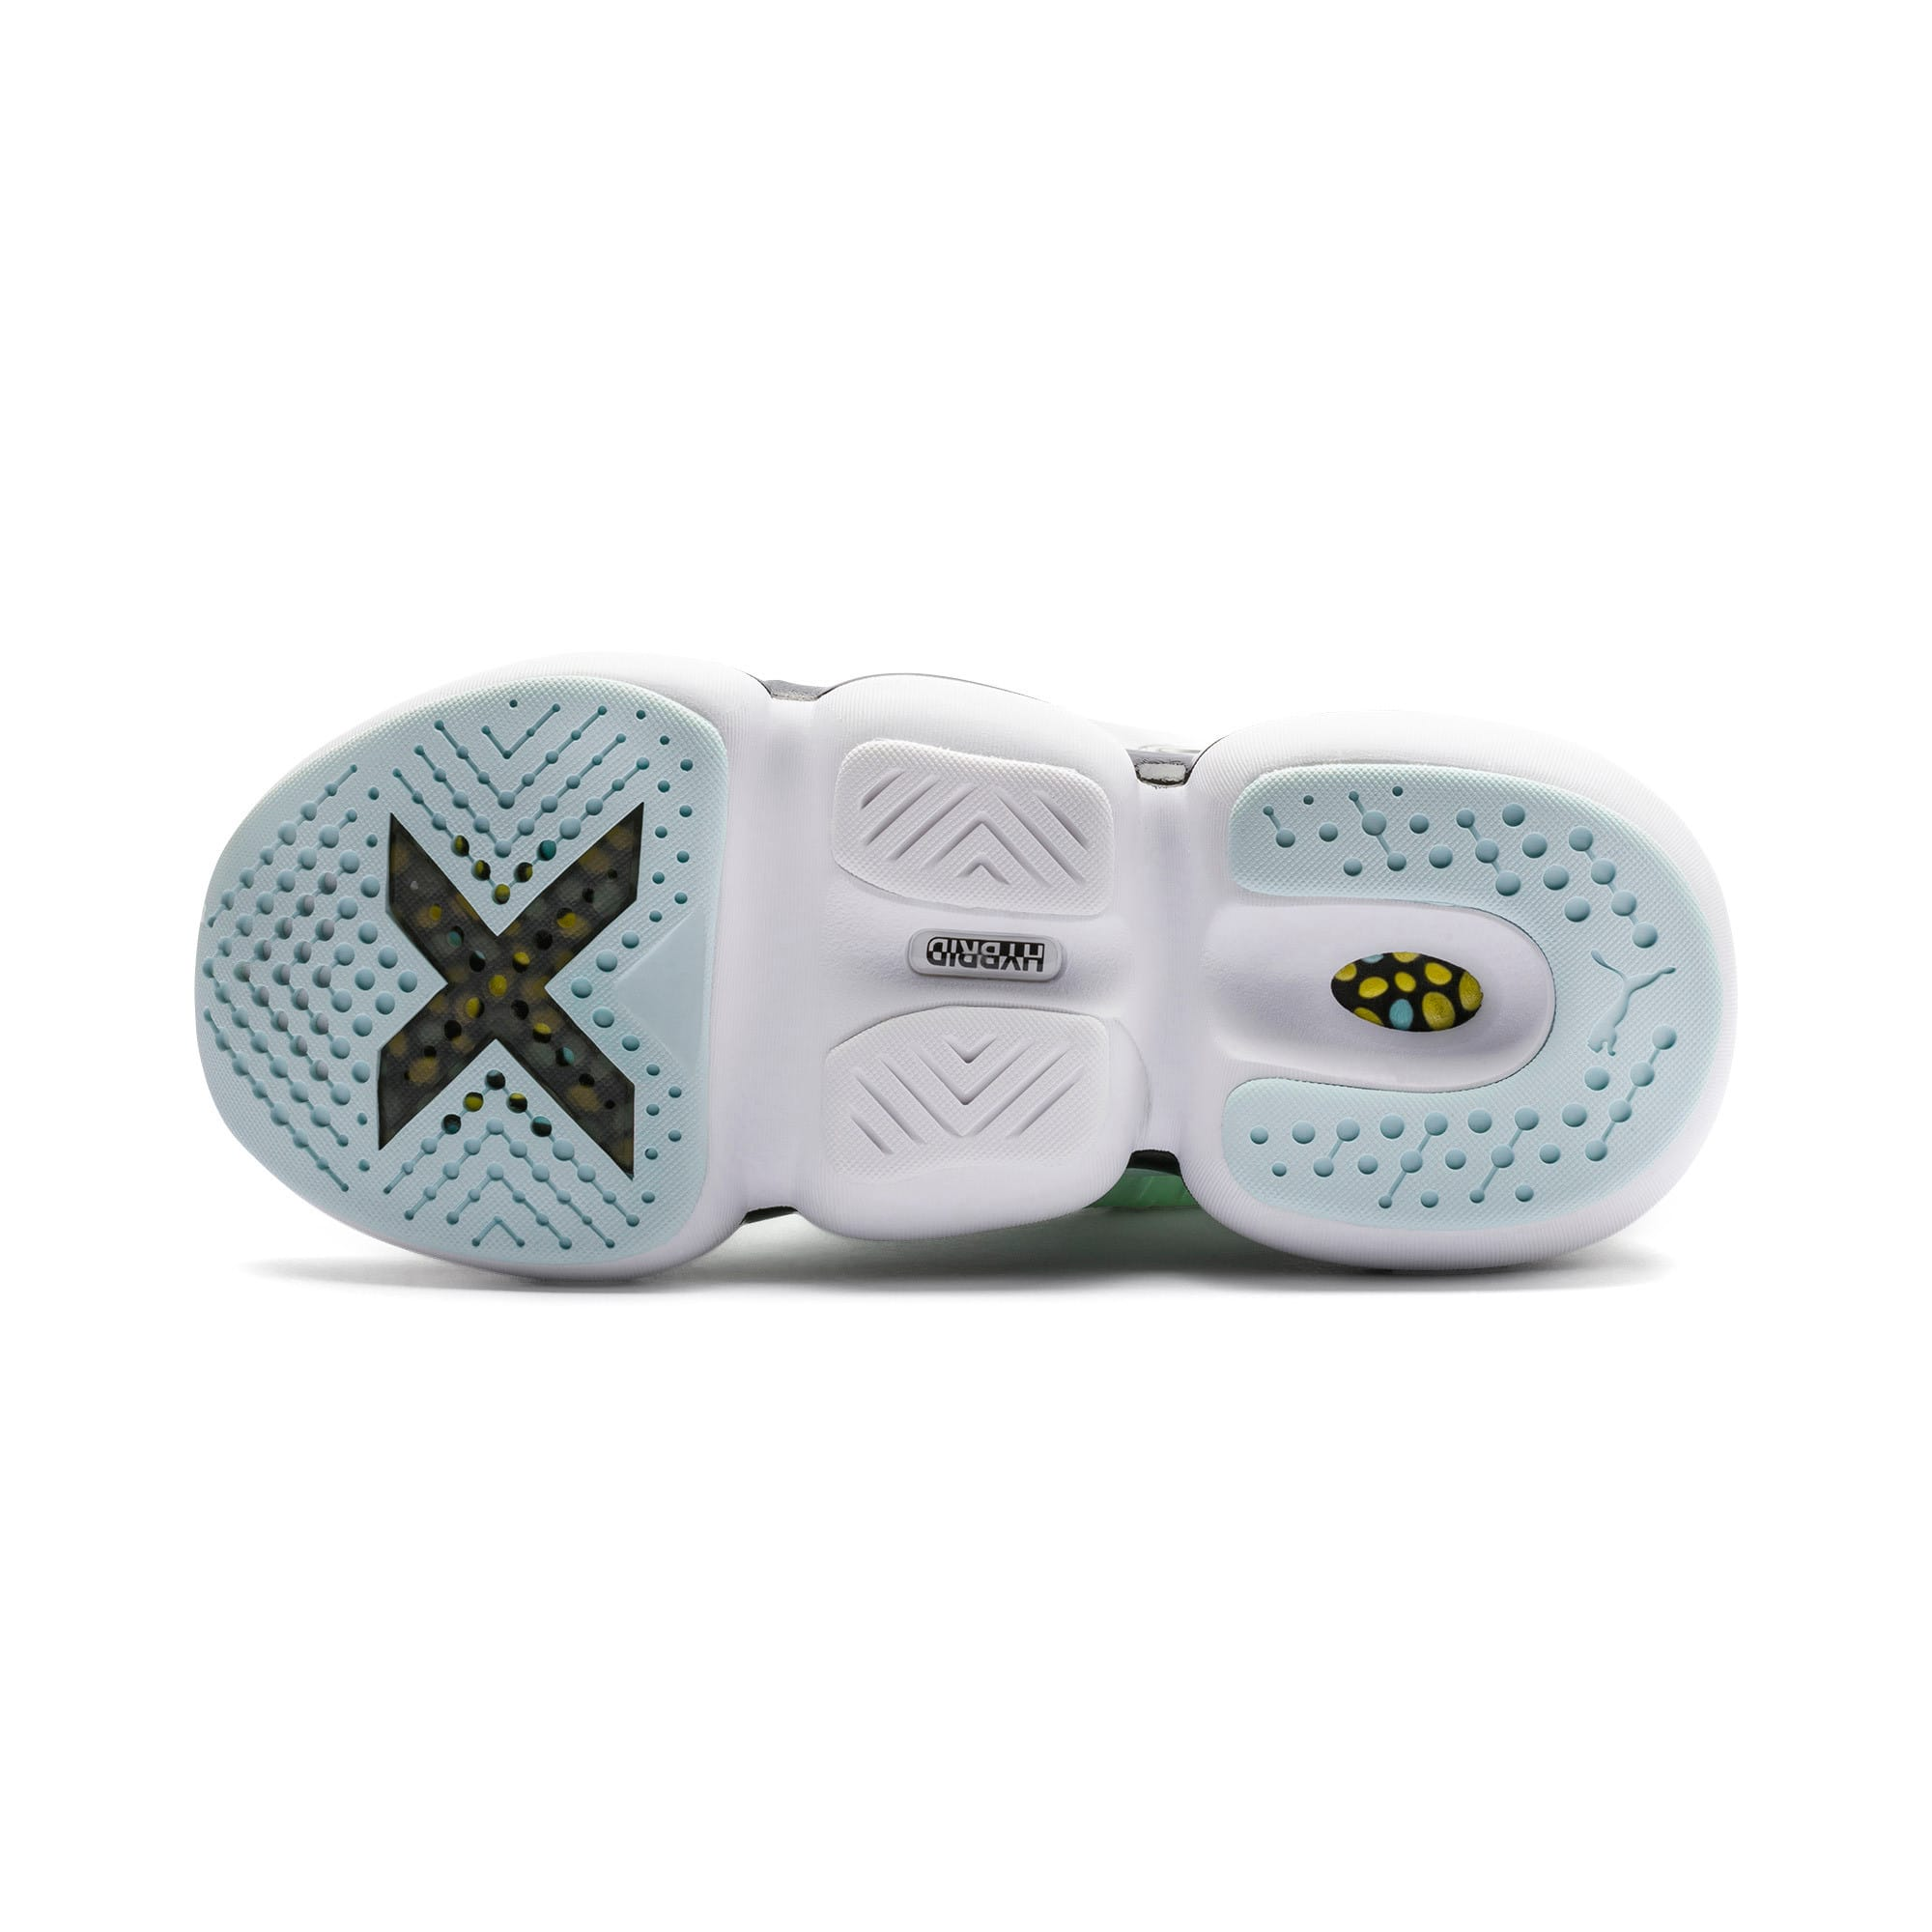 Thumbnail 5 of Mode XT Trailblazer Women's Training Shoes, Fair Aqua-Puma White, medium